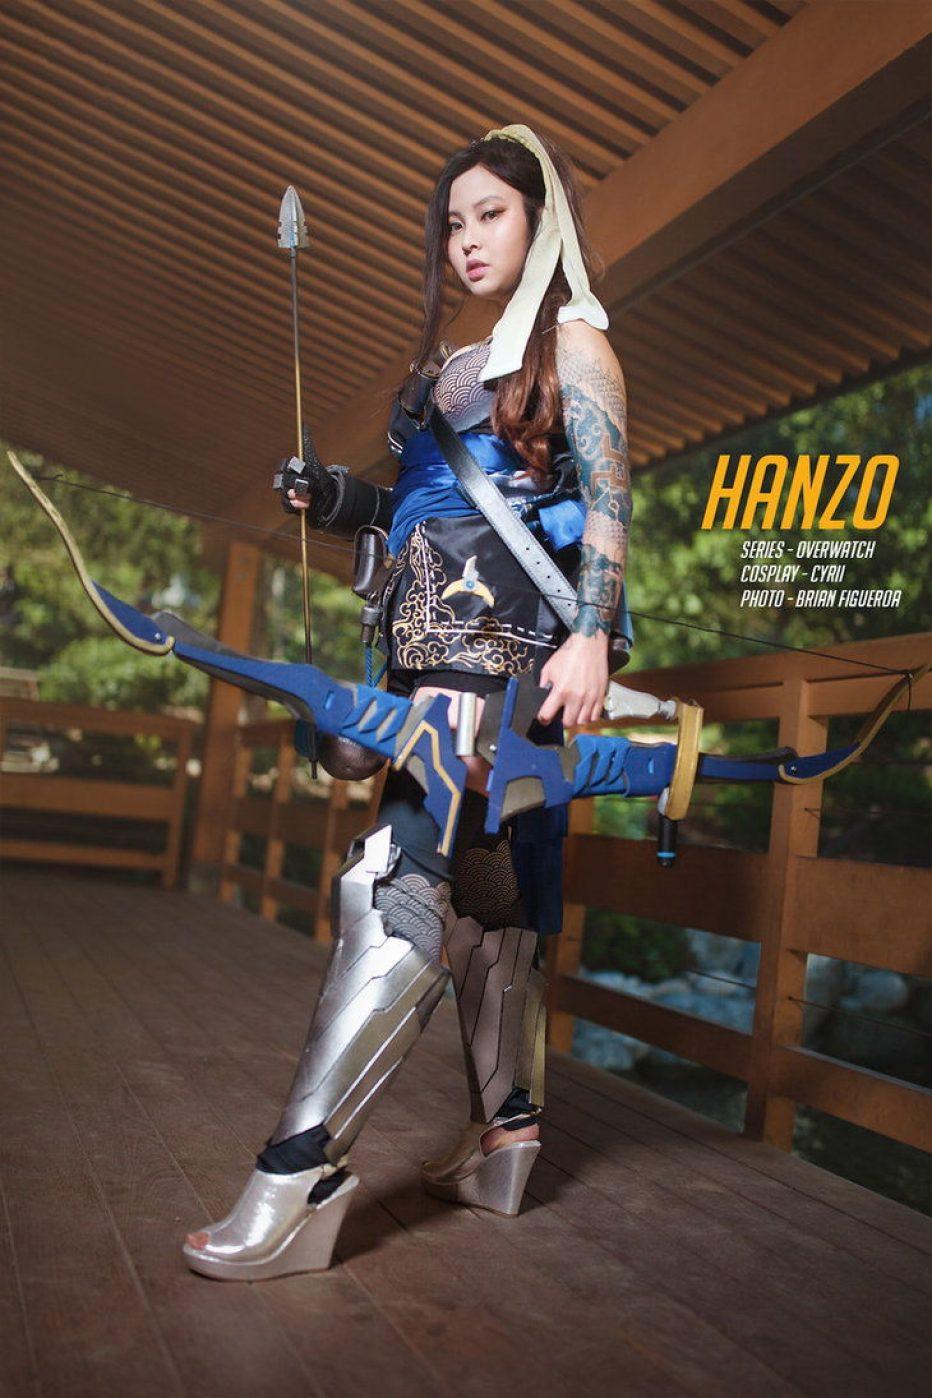 Cosplay Wednesday - Overwatch's Hanzo (Female) - GamersHeroes